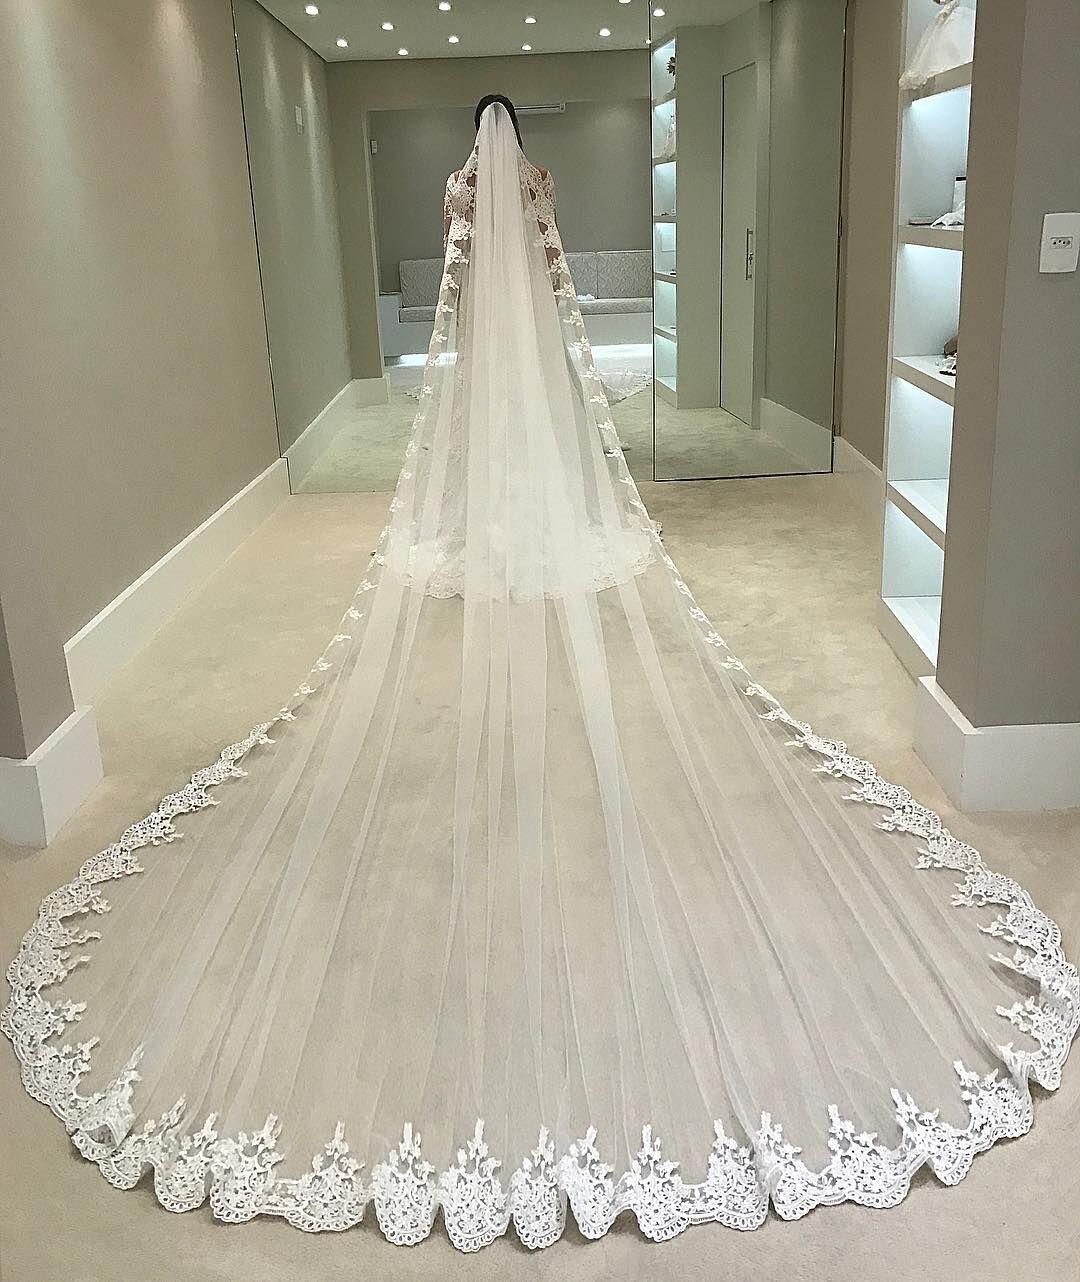 Lace Edge Appliques Bridal Veils Luxury Bridal Veils Cathedral Train One Layer Veils Veils With Comb Wedding Veils Lace Tulle Bridal Veil Long Veil Wedding [ 1282 x 1080 Pixel ]